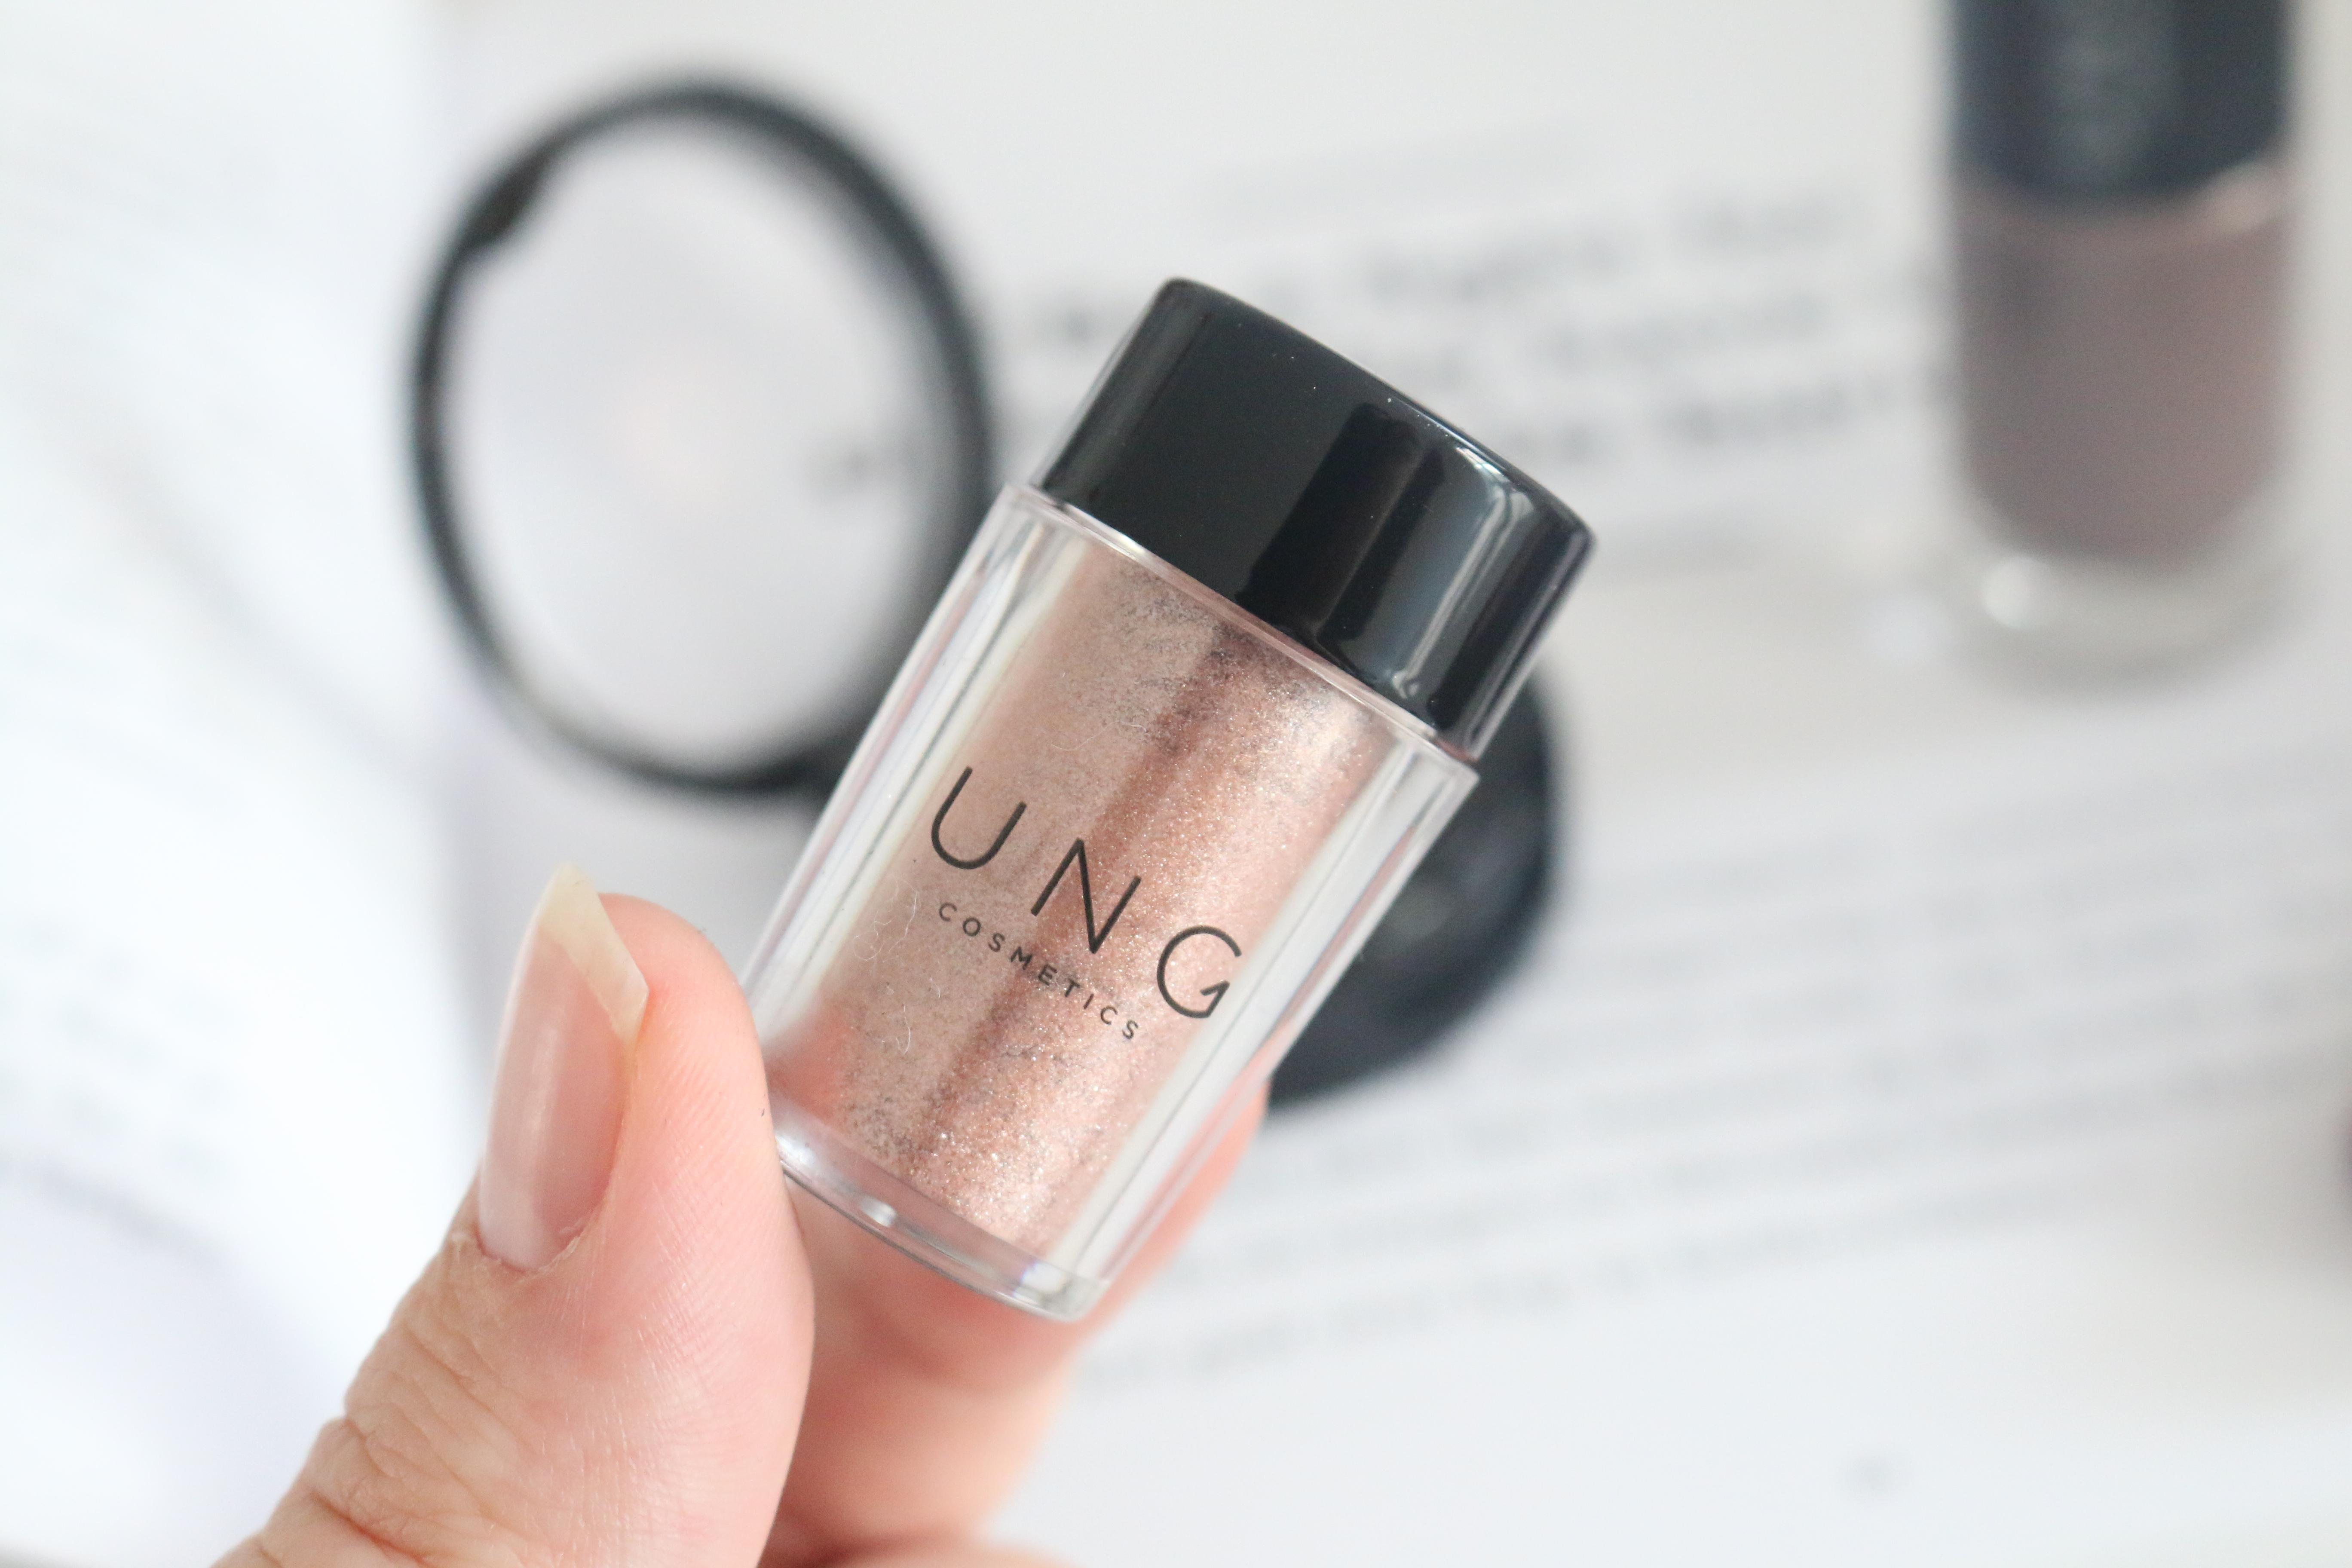 UNG Cosmetics Colour Pigment Glitter Glam Luster